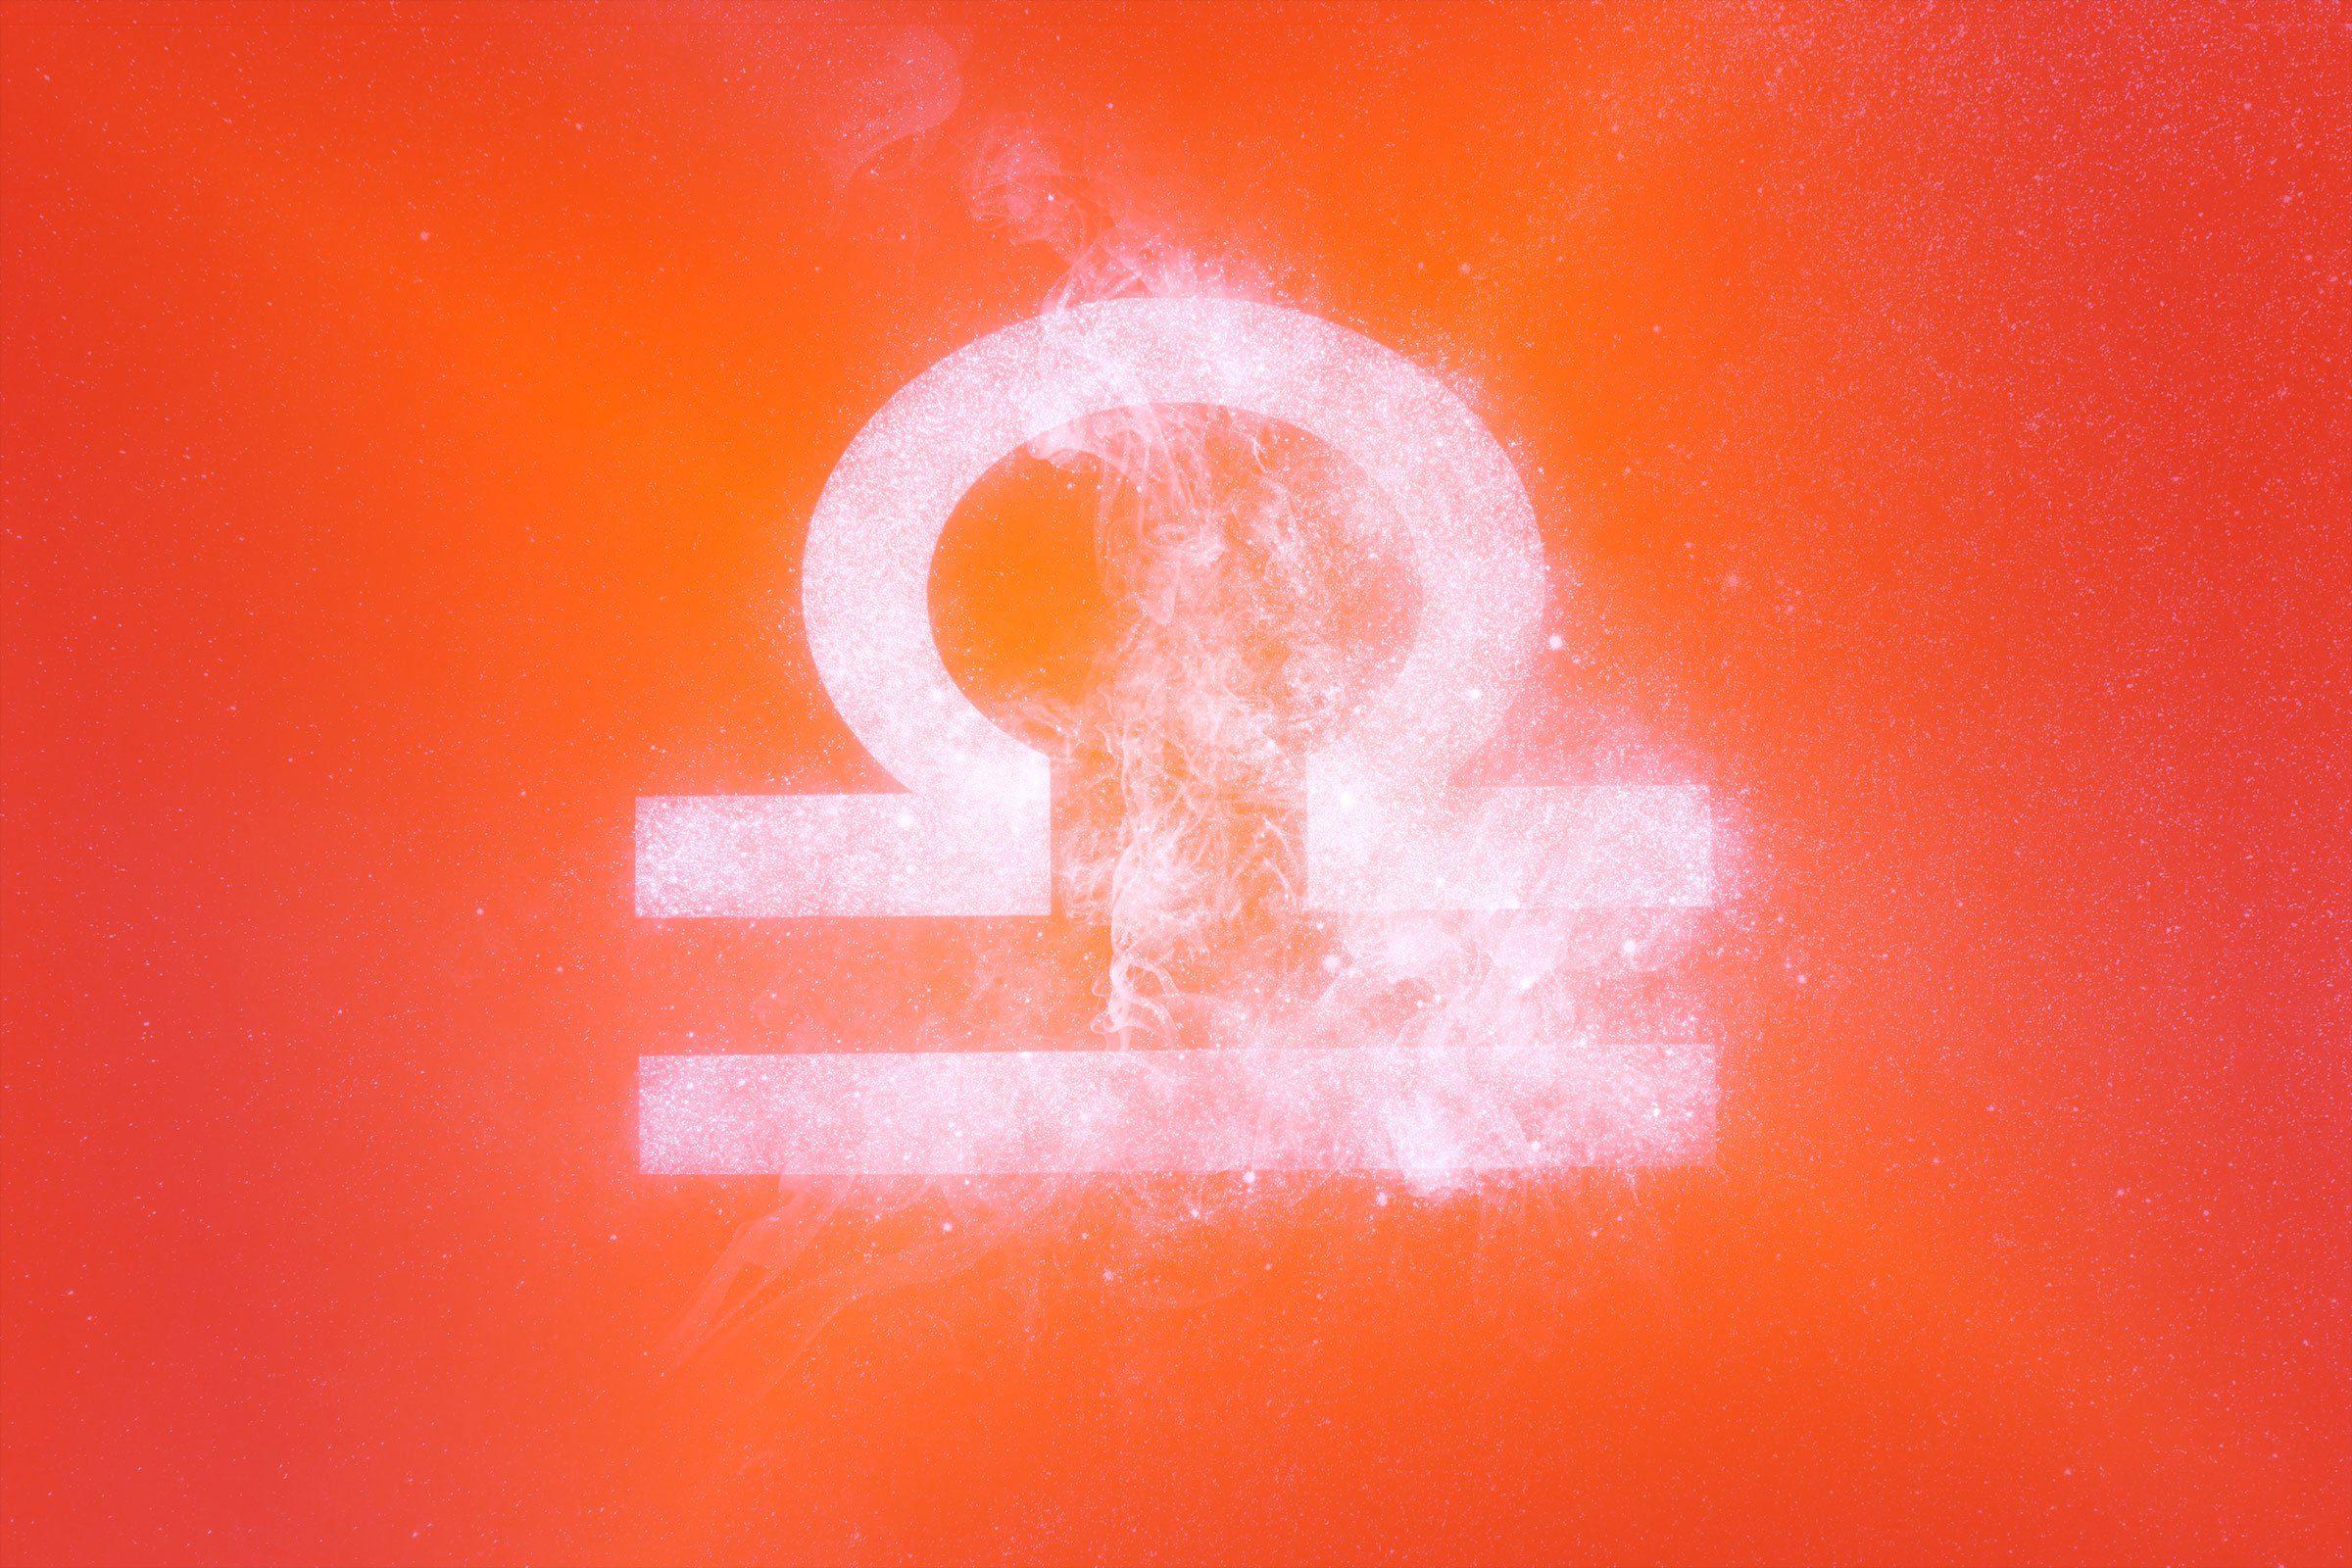 libra symbol with red-orange gradient overlay